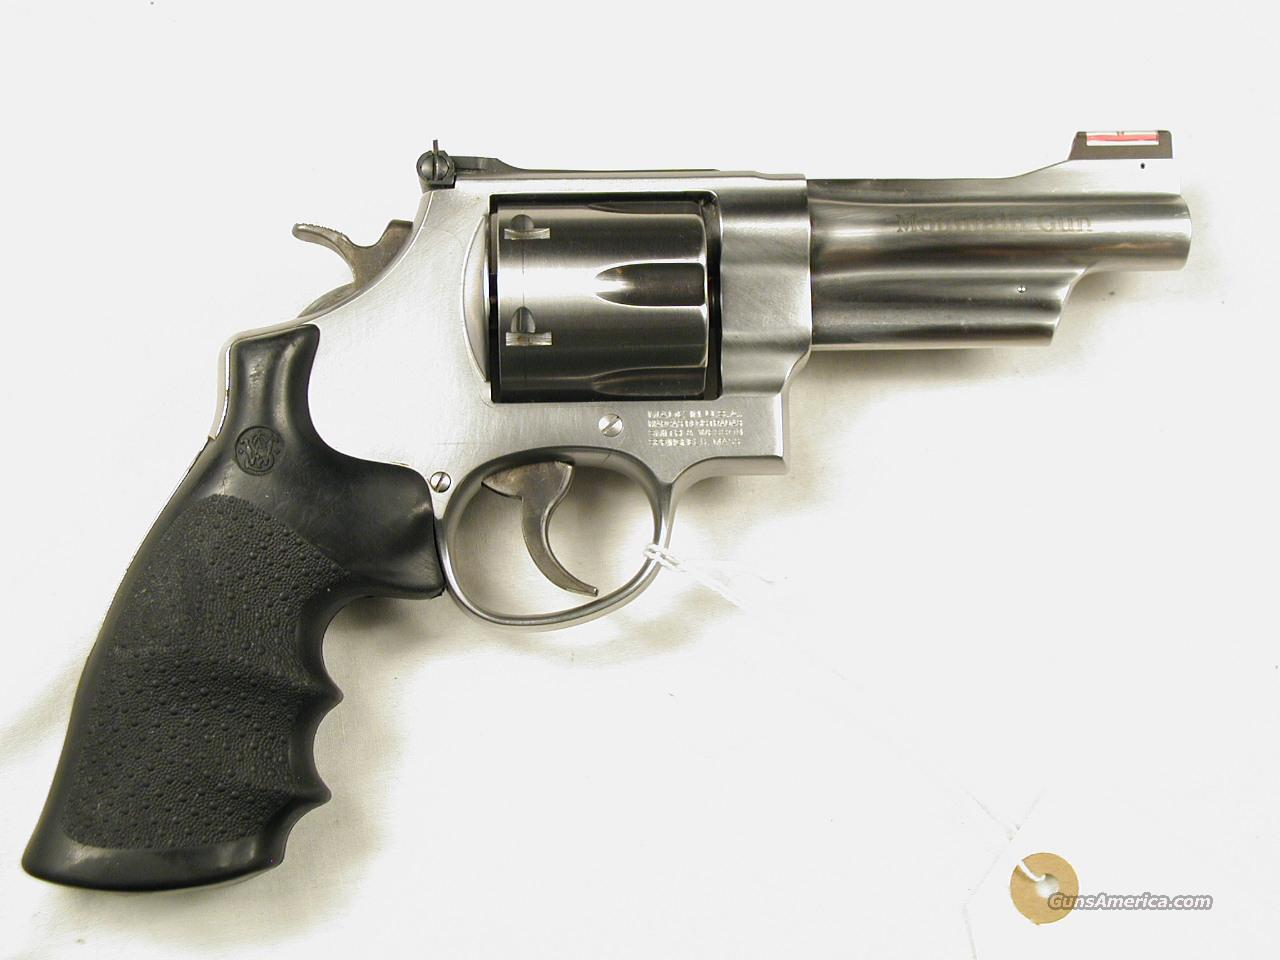 SMITH & WESSON 625 MOUNTAIN GUN 45 LC For Sale